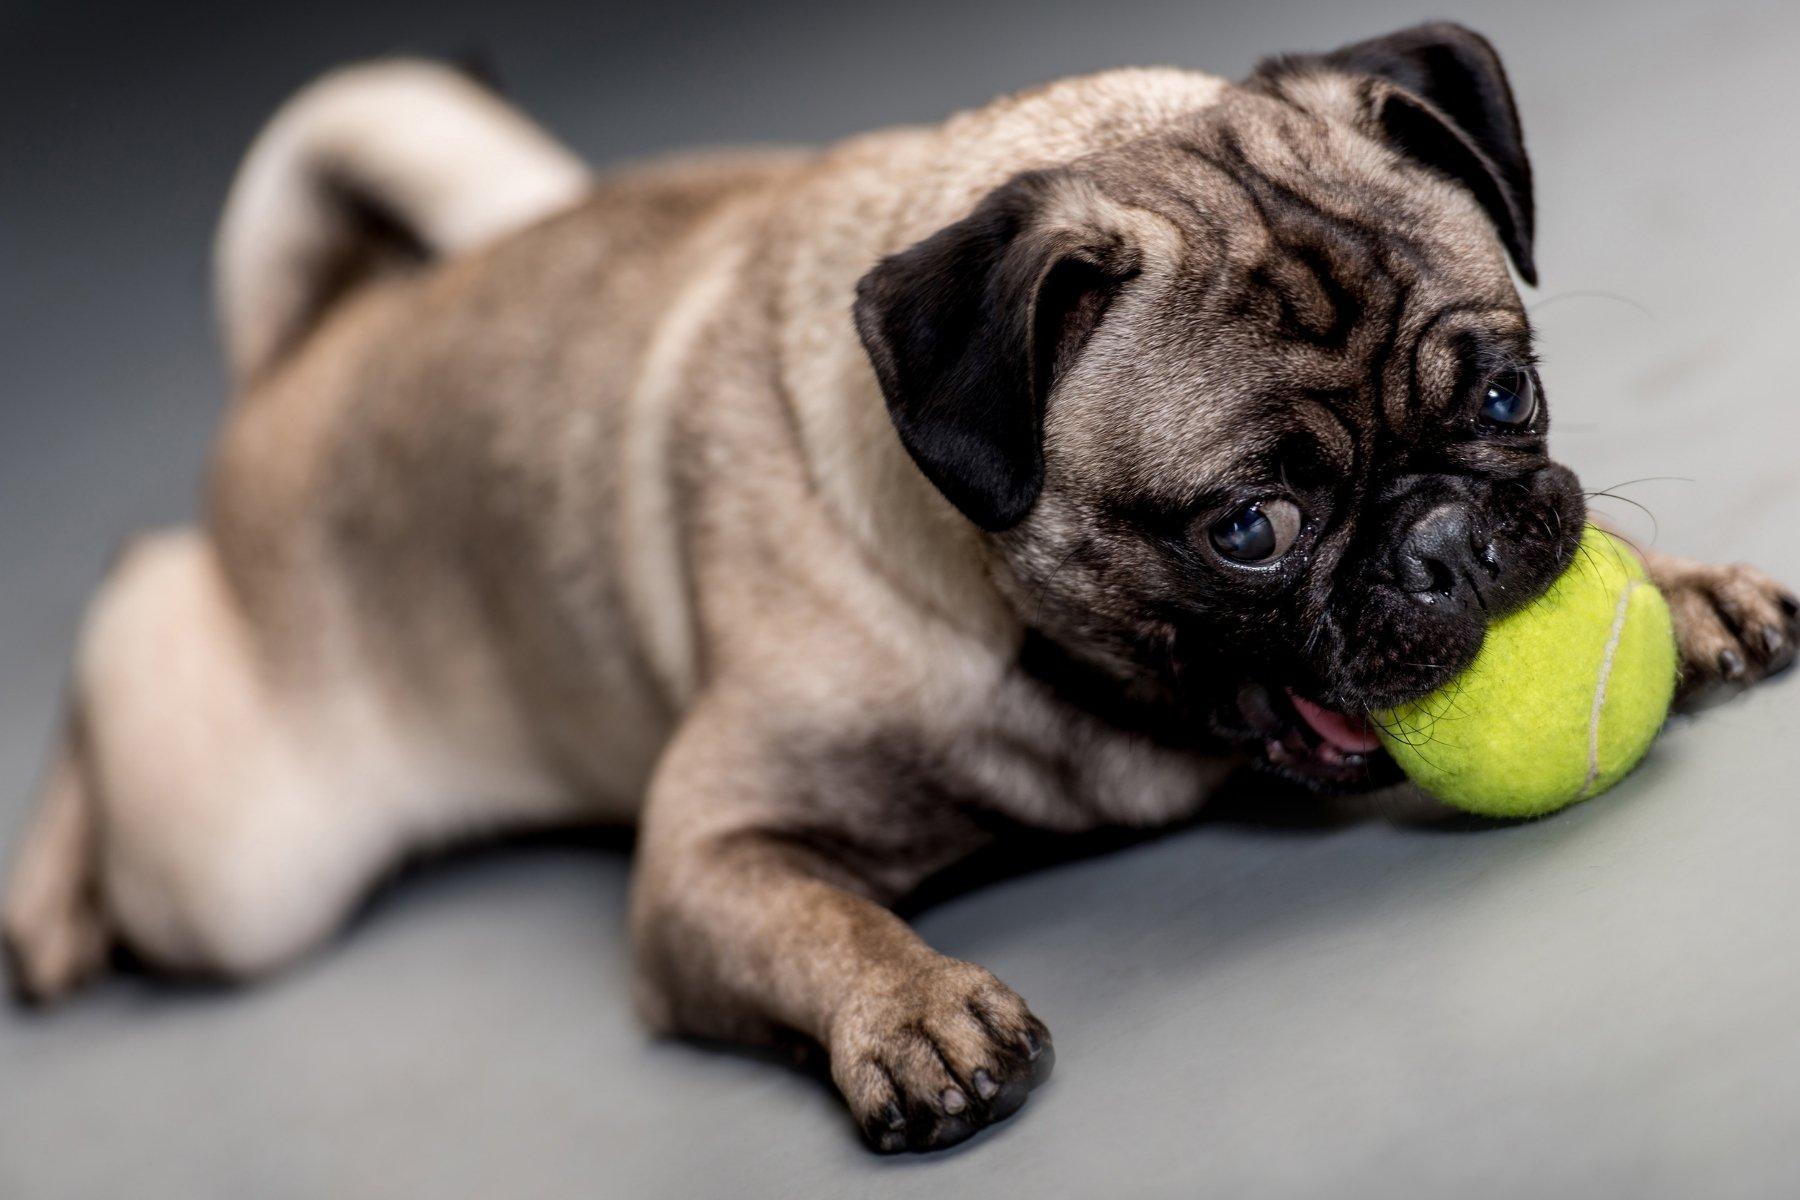 Pug deserves a toy!